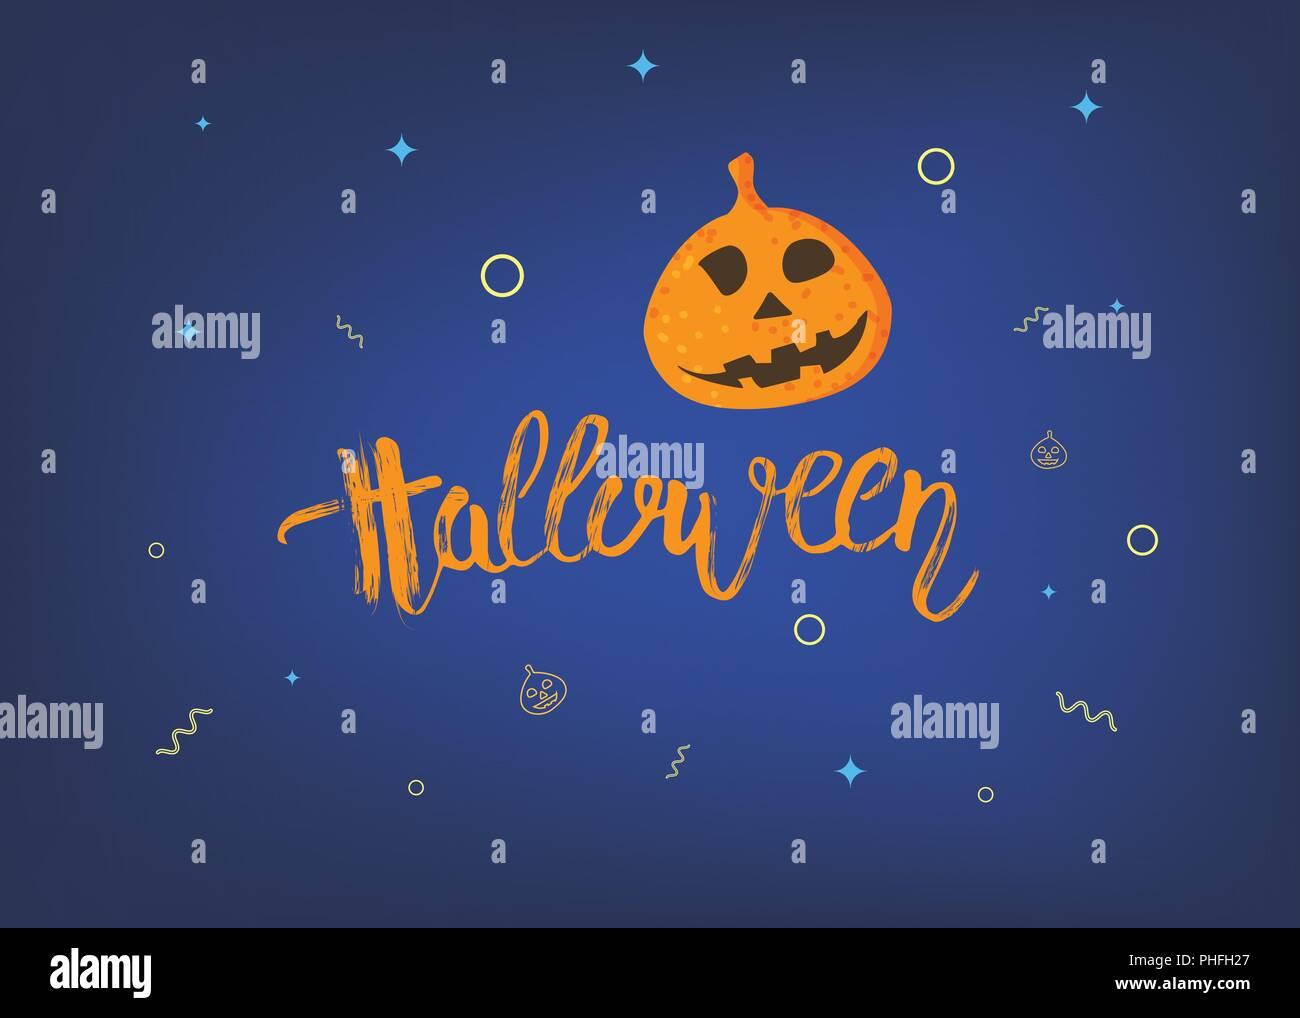 halloween template with pumpkin shape and handwritten dry brush